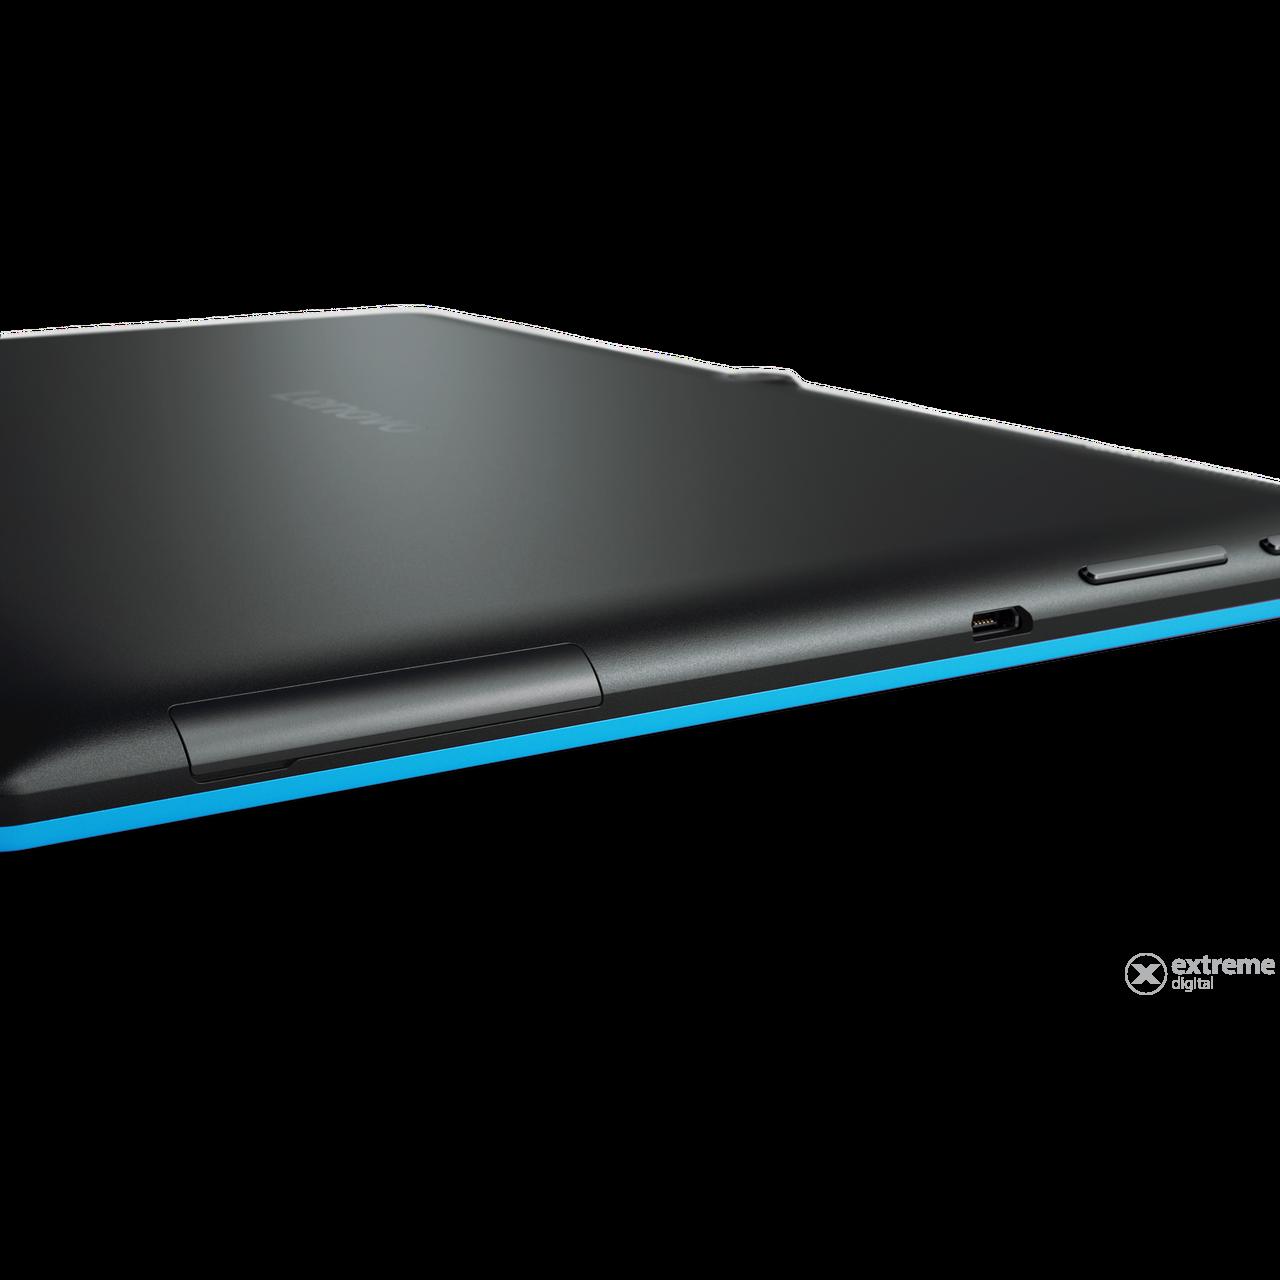 lenovo tab 10 tb x103f za1u0074bg 10 1 16gb tablet extreme digital. Black Bedroom Furniture Sets. Home Design Ideas